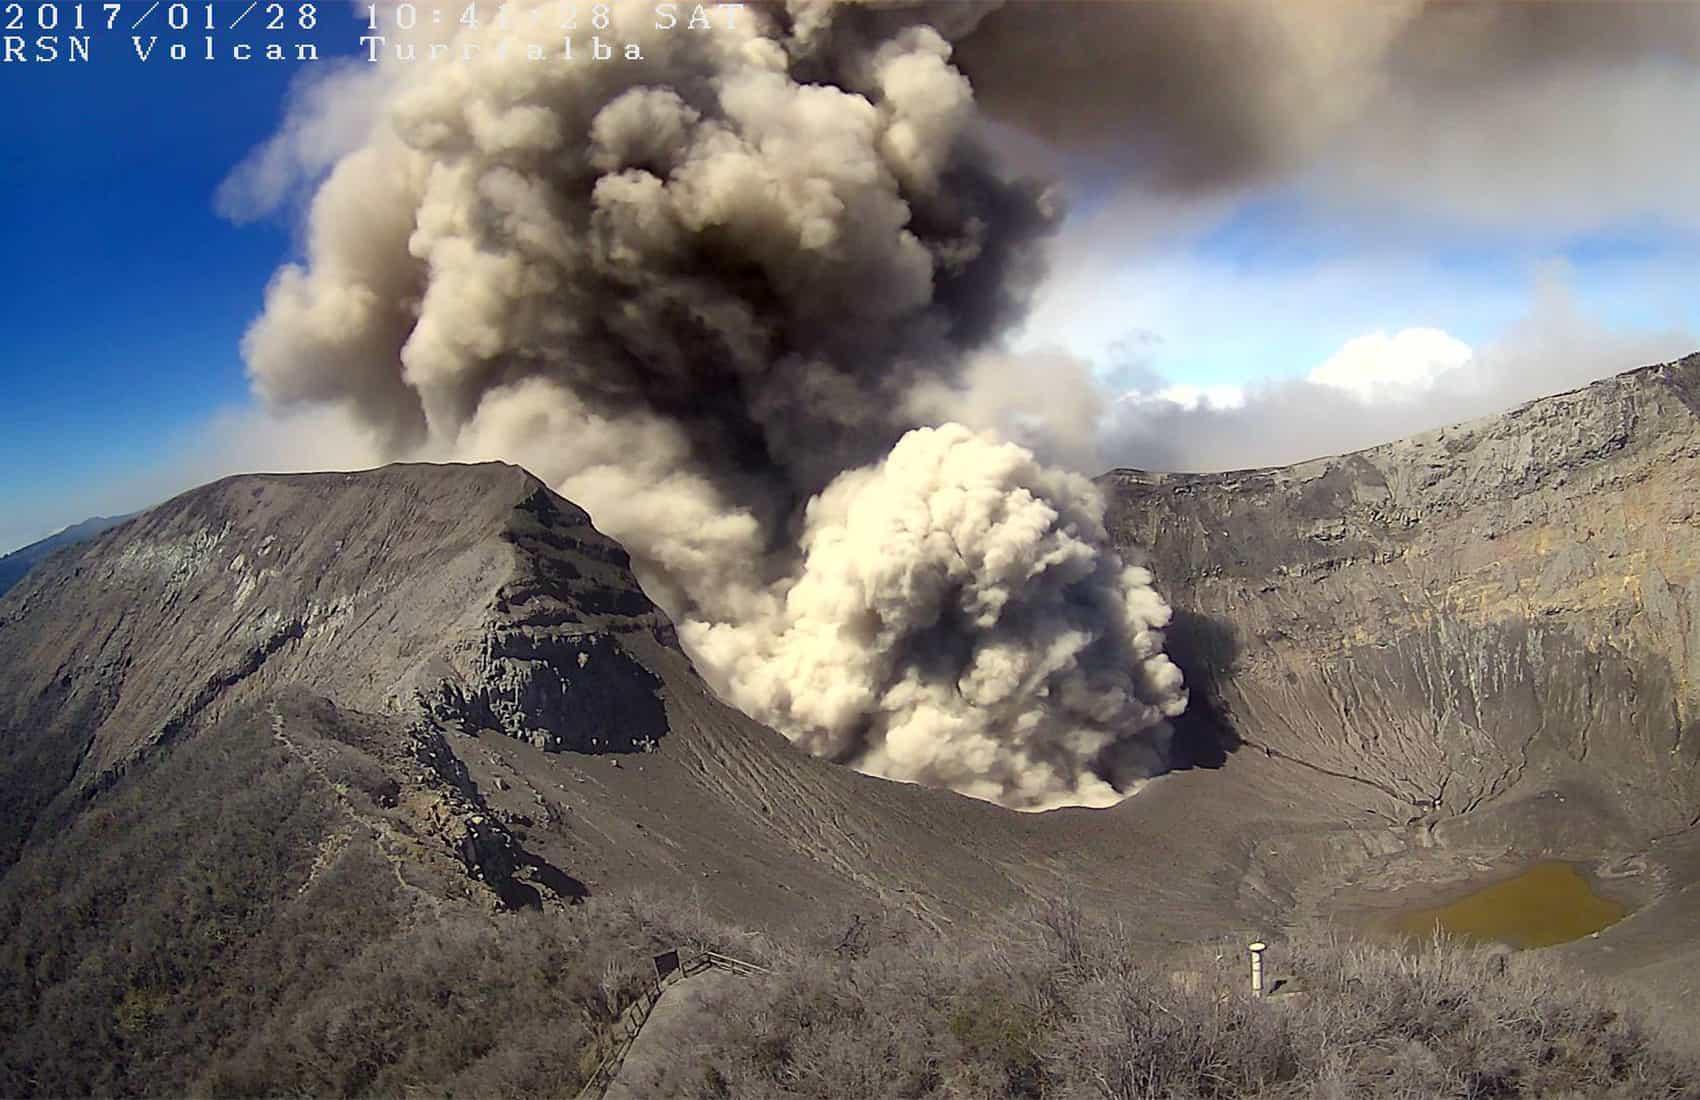 Vapor/Ash explosion at Turrialba Volcano. Jan. 28, 2017.